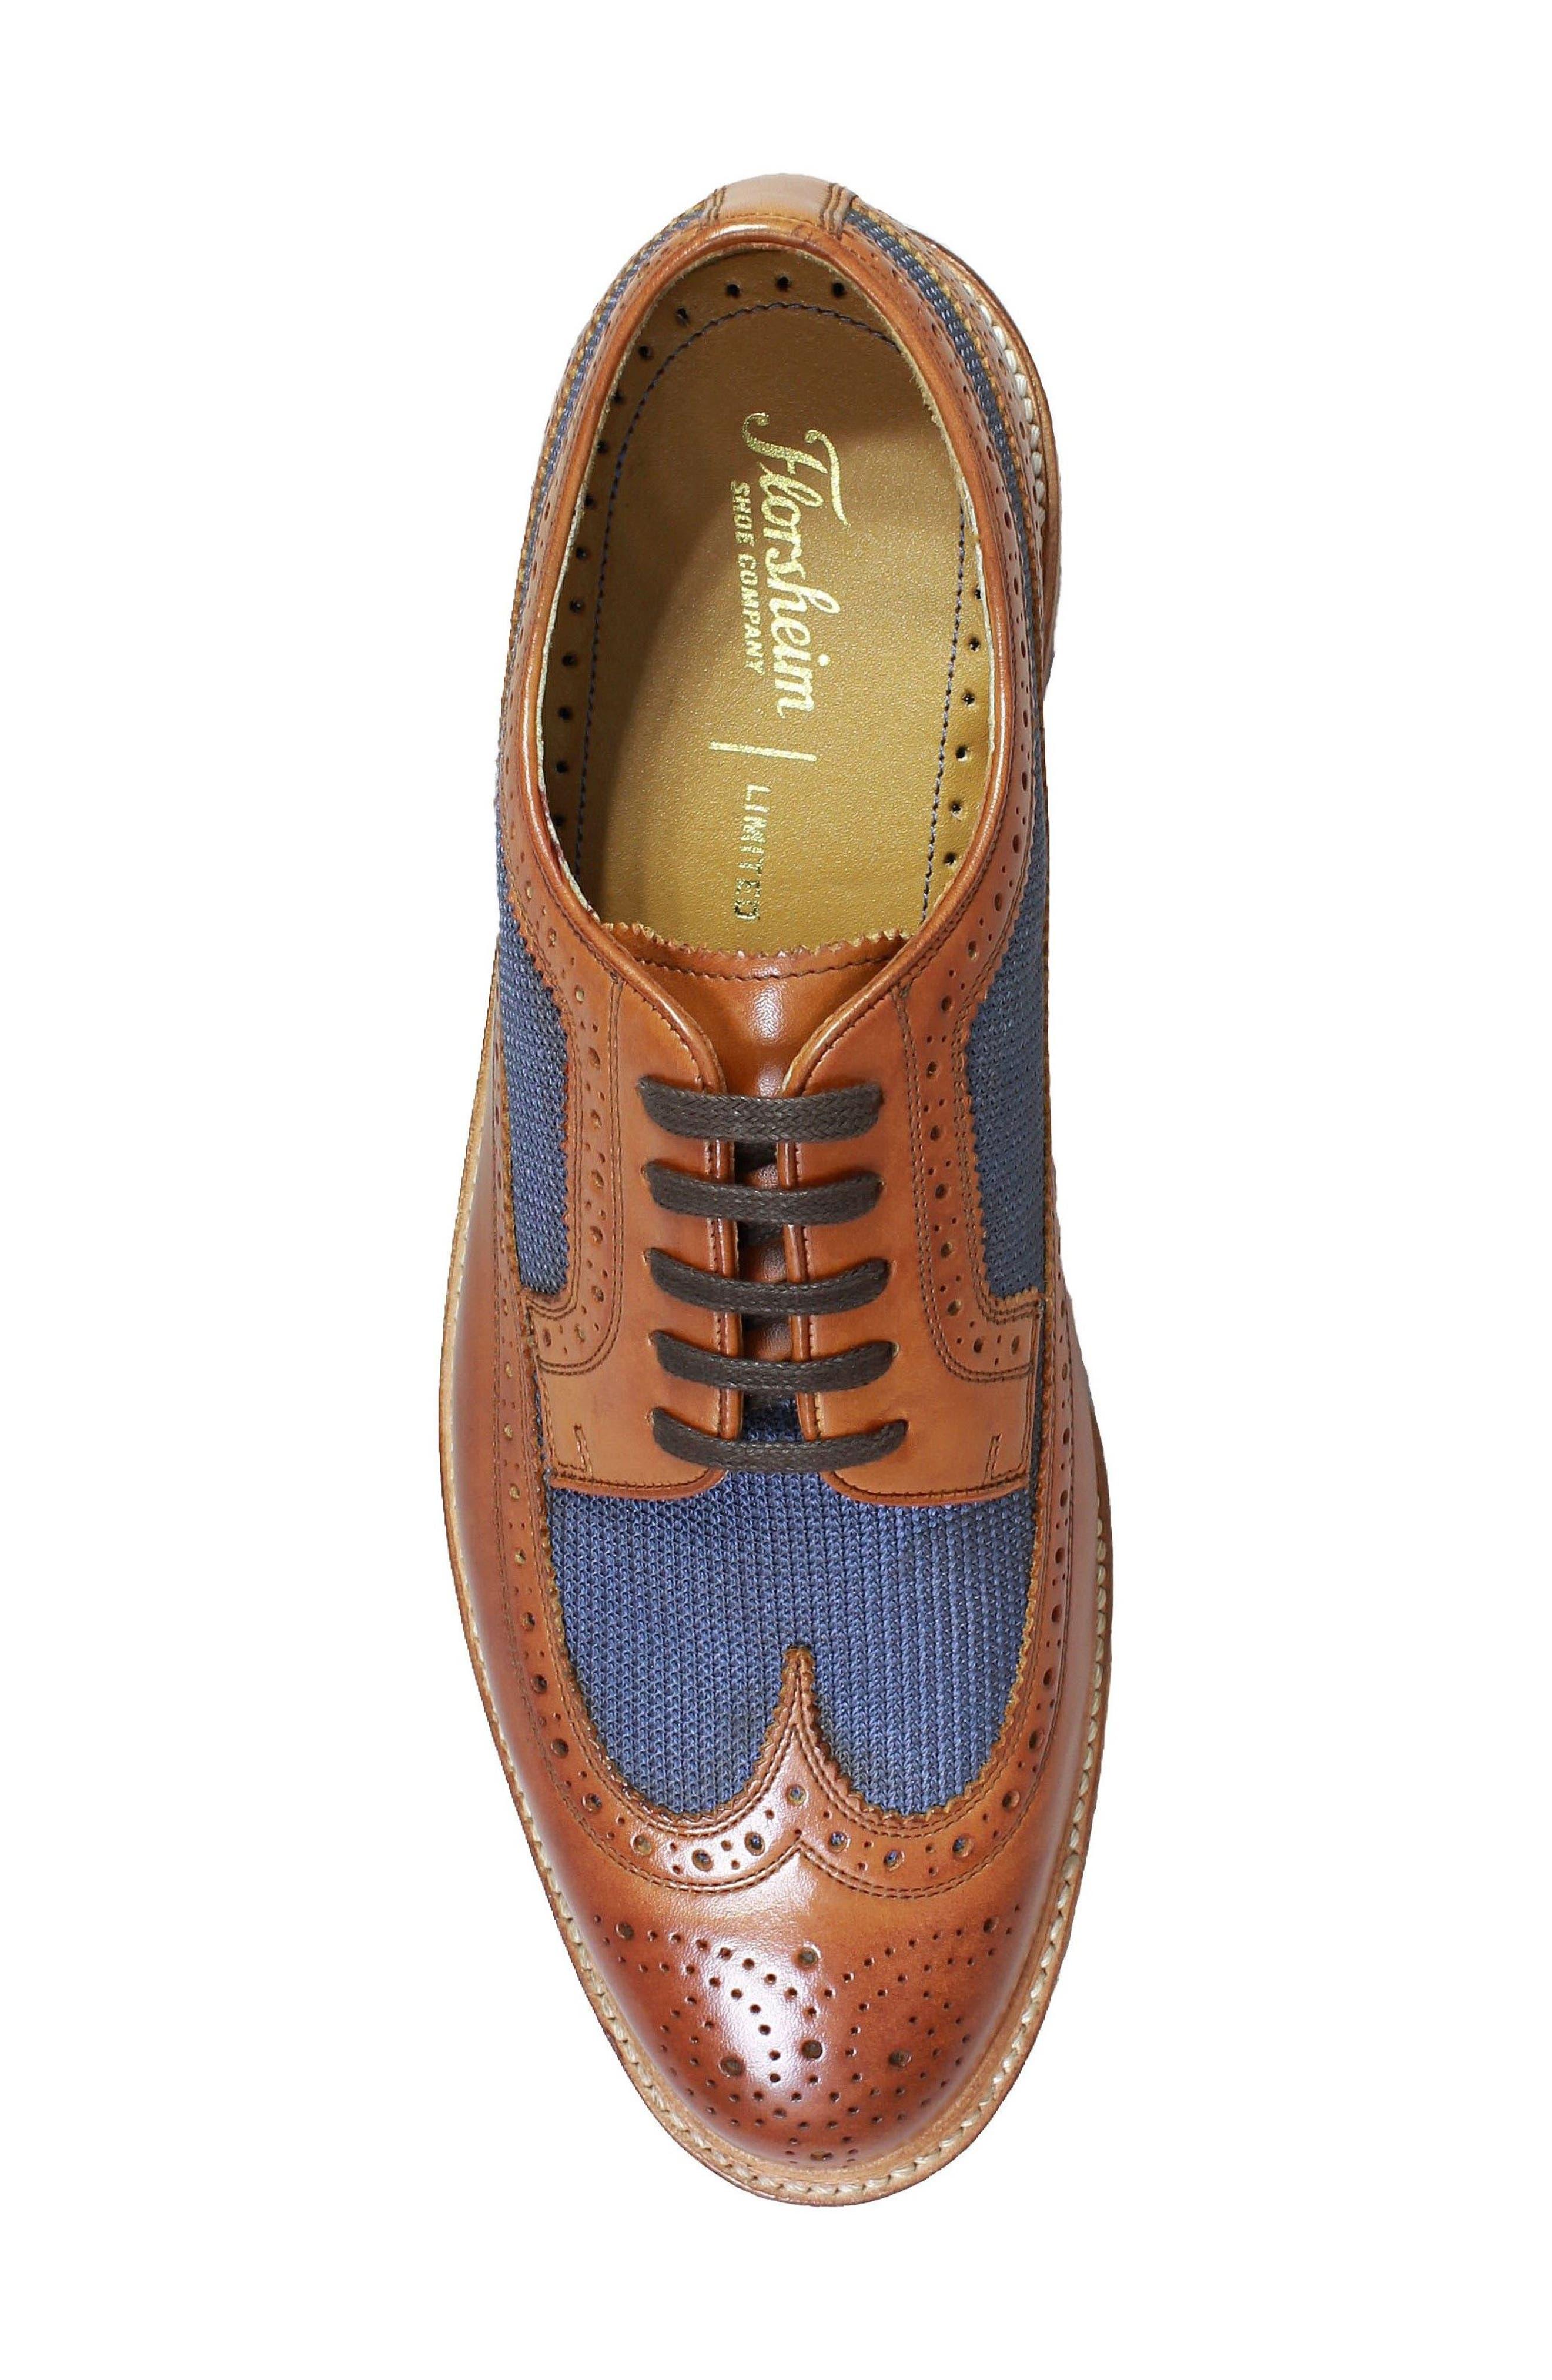 'Heritage' Wingtip,                             Alternate thumbnail 5, color,                             Cognac Leather/ Mesh